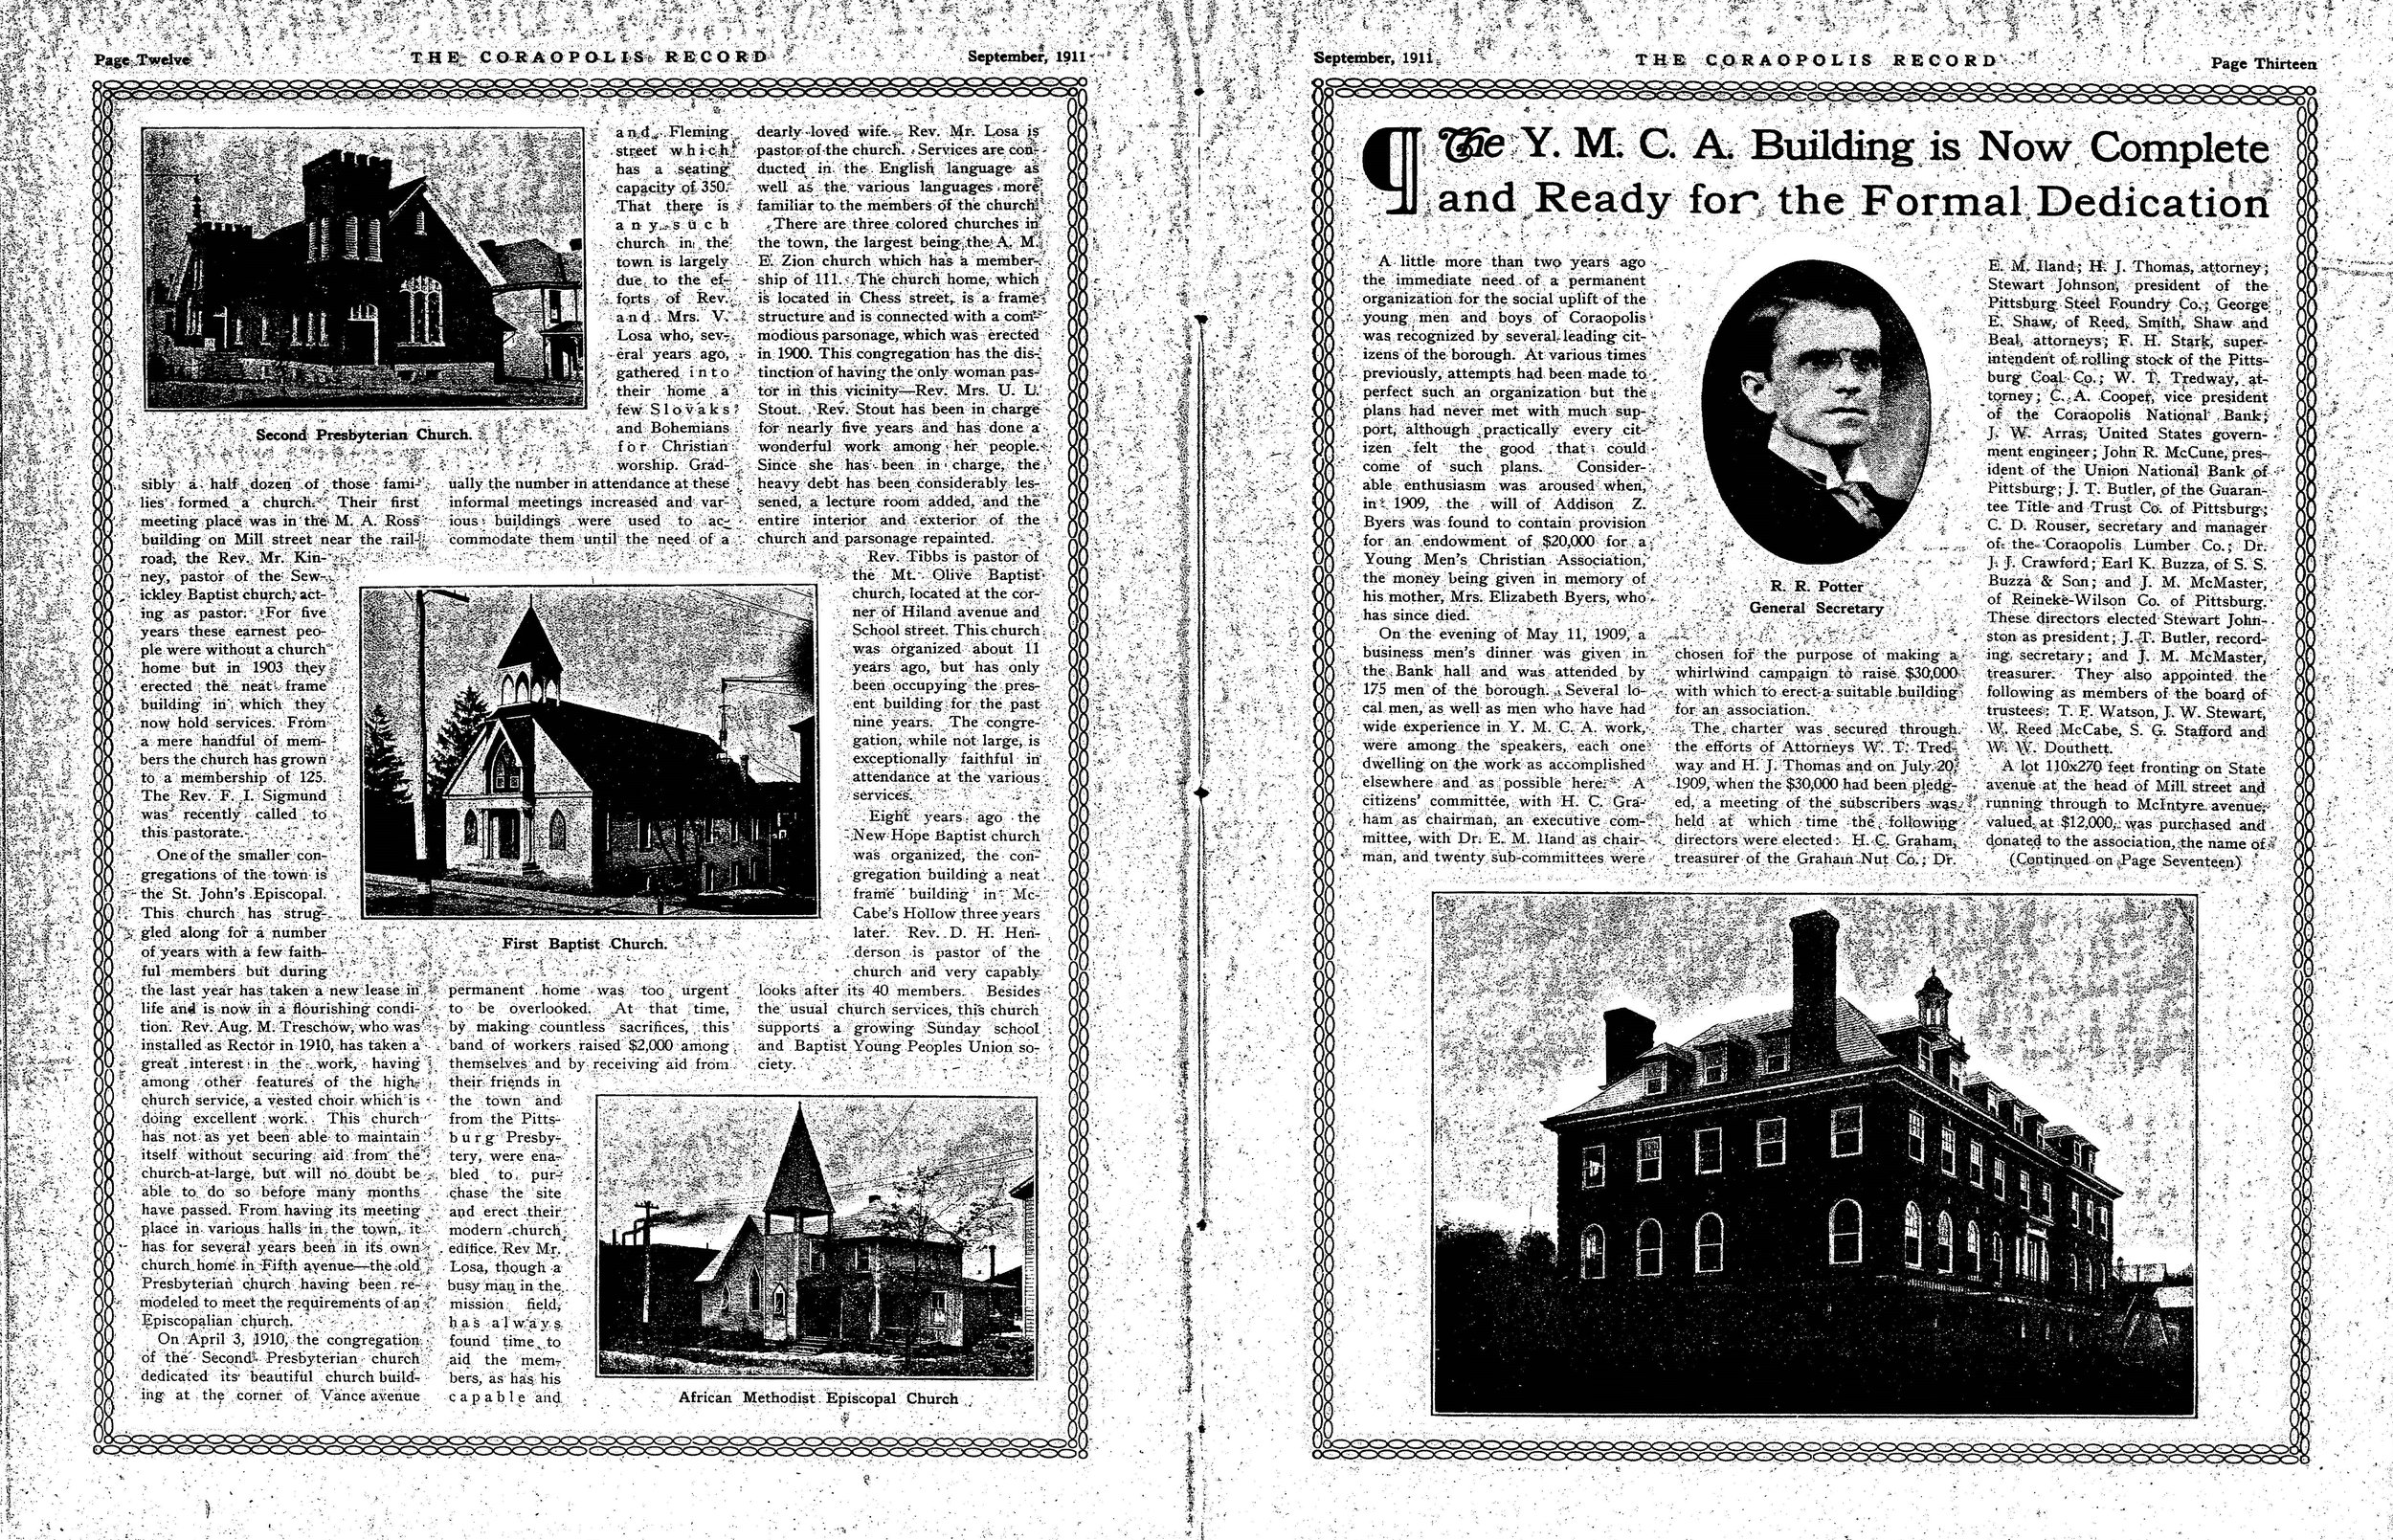 1911-09-15 The Coraopolis Record_Page_09.jpg